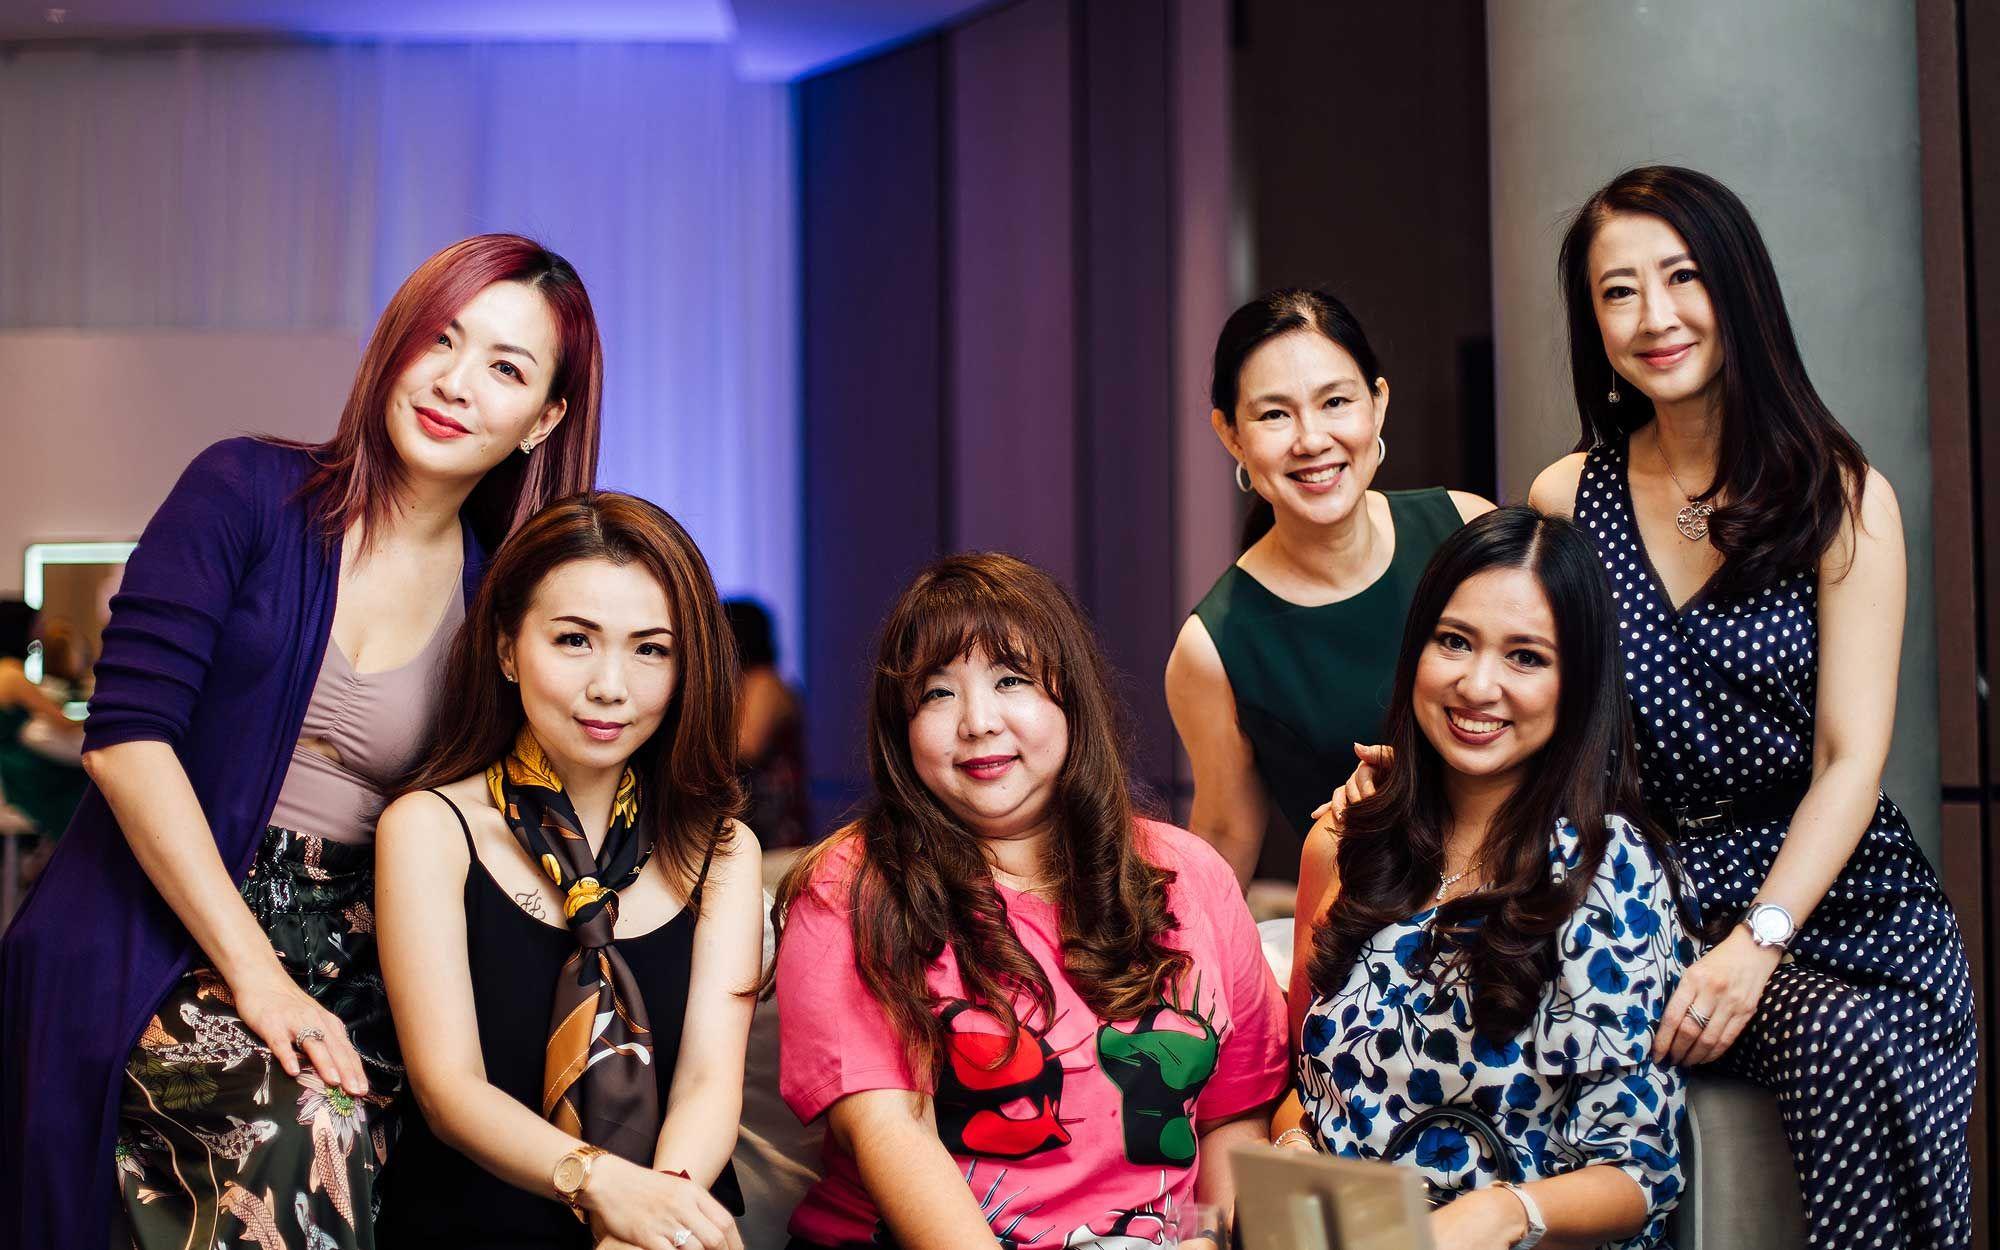 Cherrie Chin, Pauline Gan, Yap Ai Leen, Datin Yvette Kang, Yap Su Lin and Christine Cheah